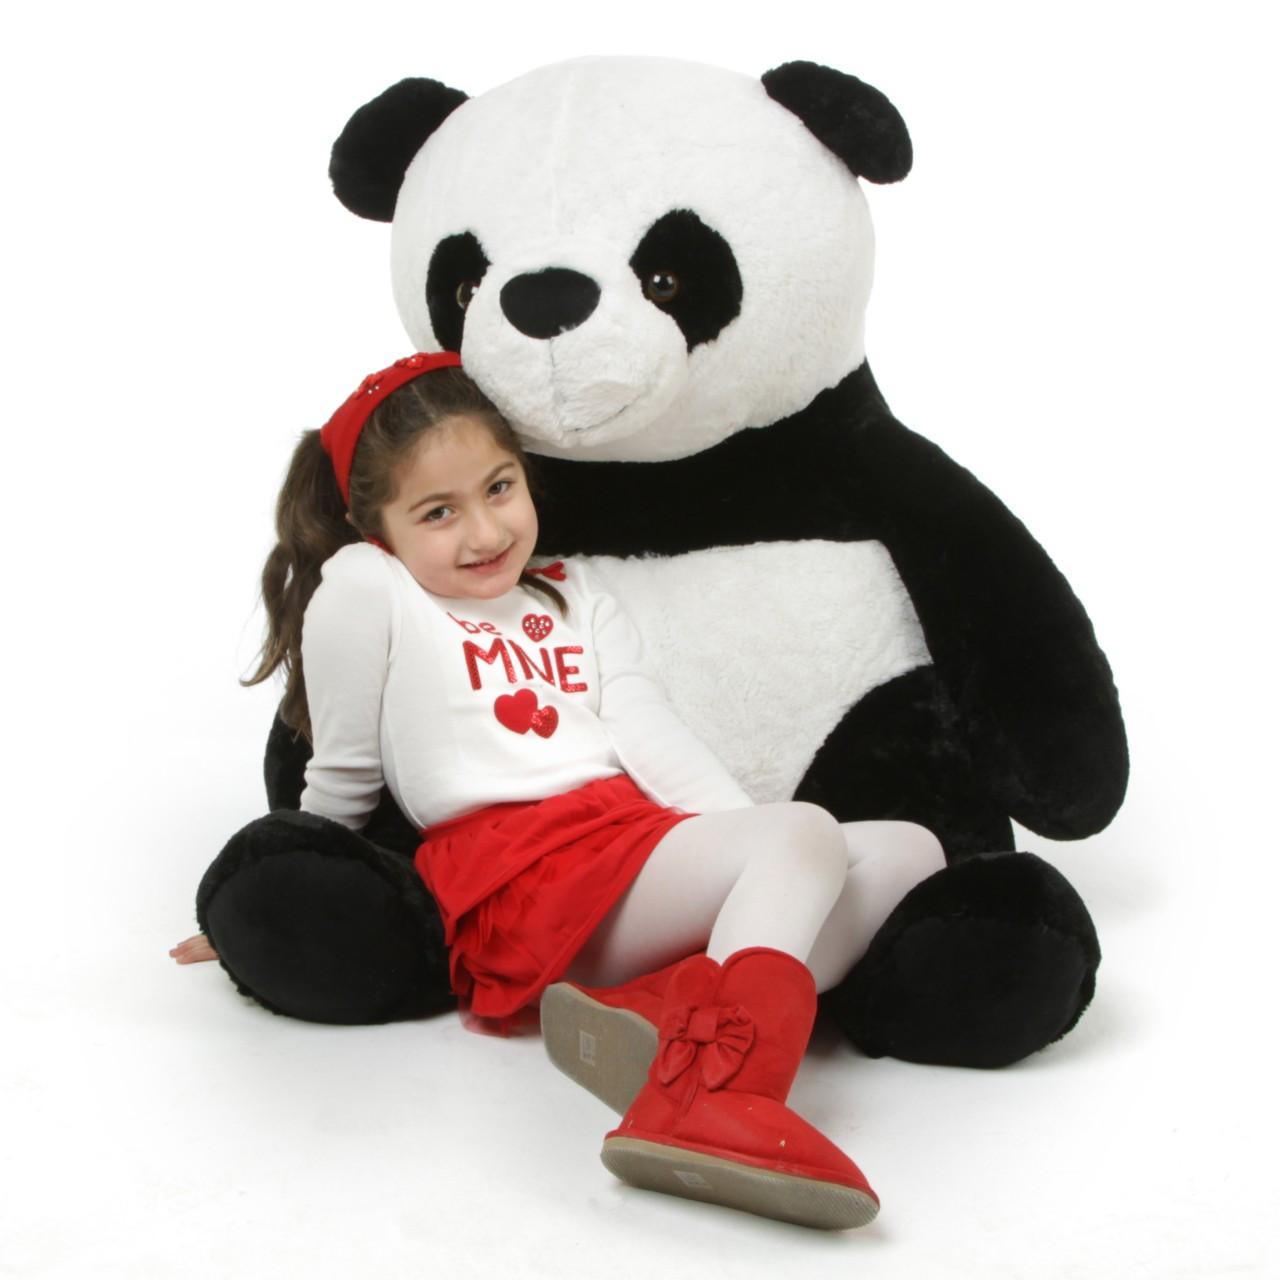 Papa Xin Giant Black And White Stuffed Panda Teddy Bear 42in